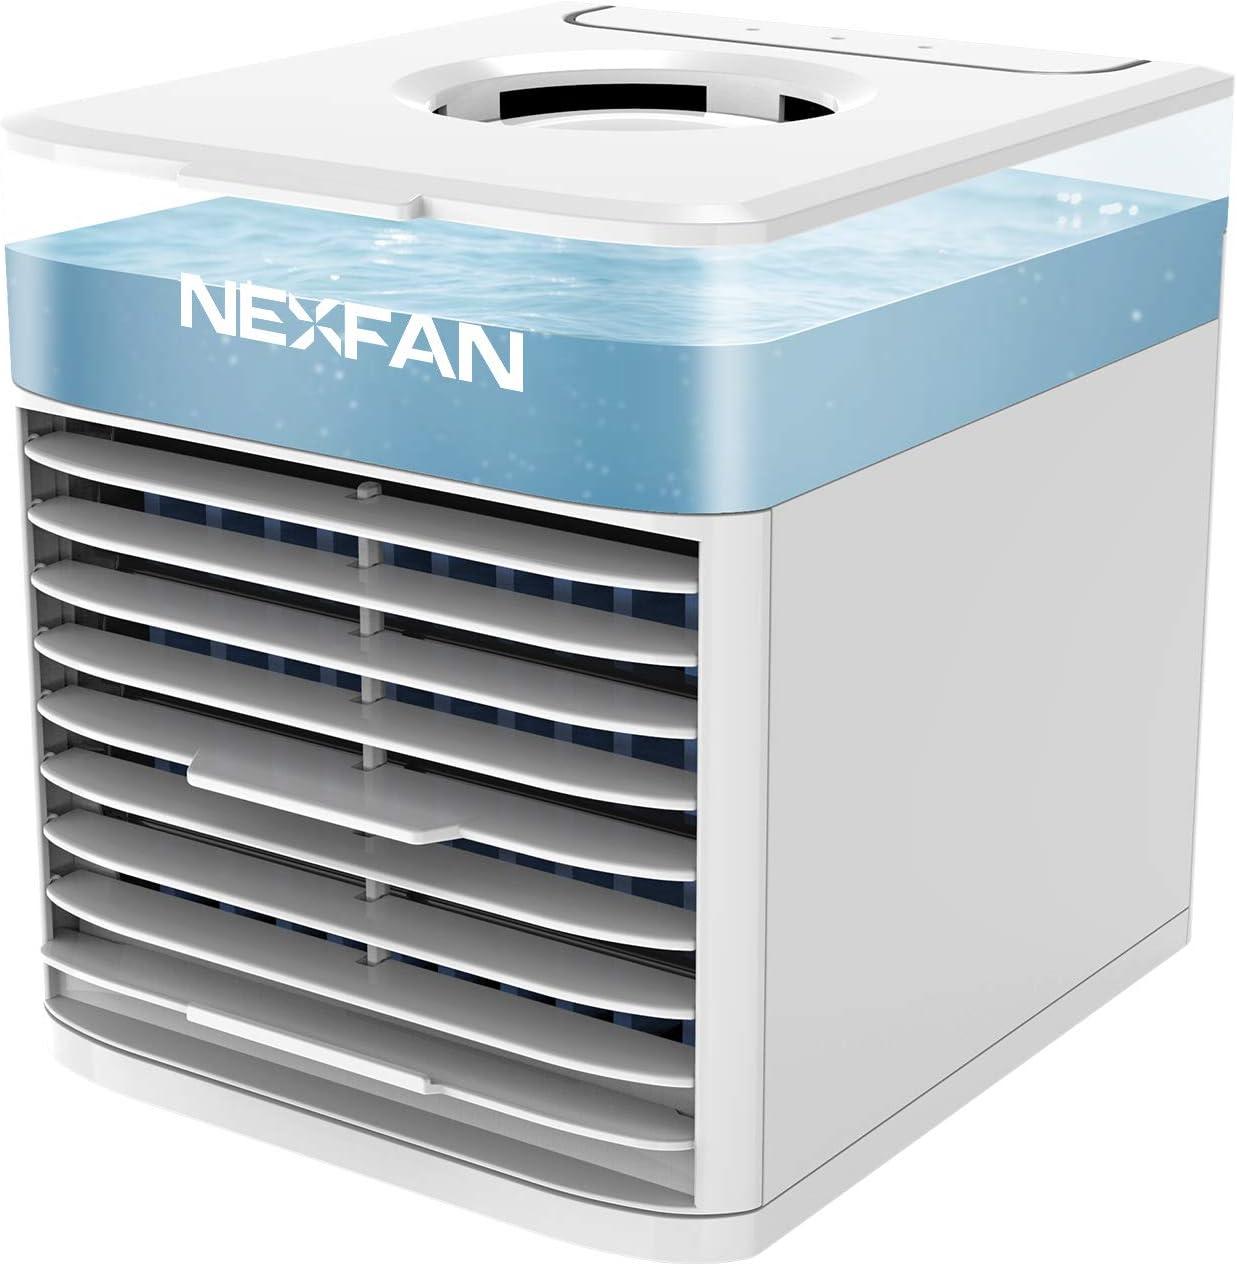 Mini Enfriador de Aire, NEXFAN Mini Acondicionador de Aire Móvil, 4 en 1 Climatizador Evaporativo Frio Ventilador Humidificador Purificador de Aire, Leakproof